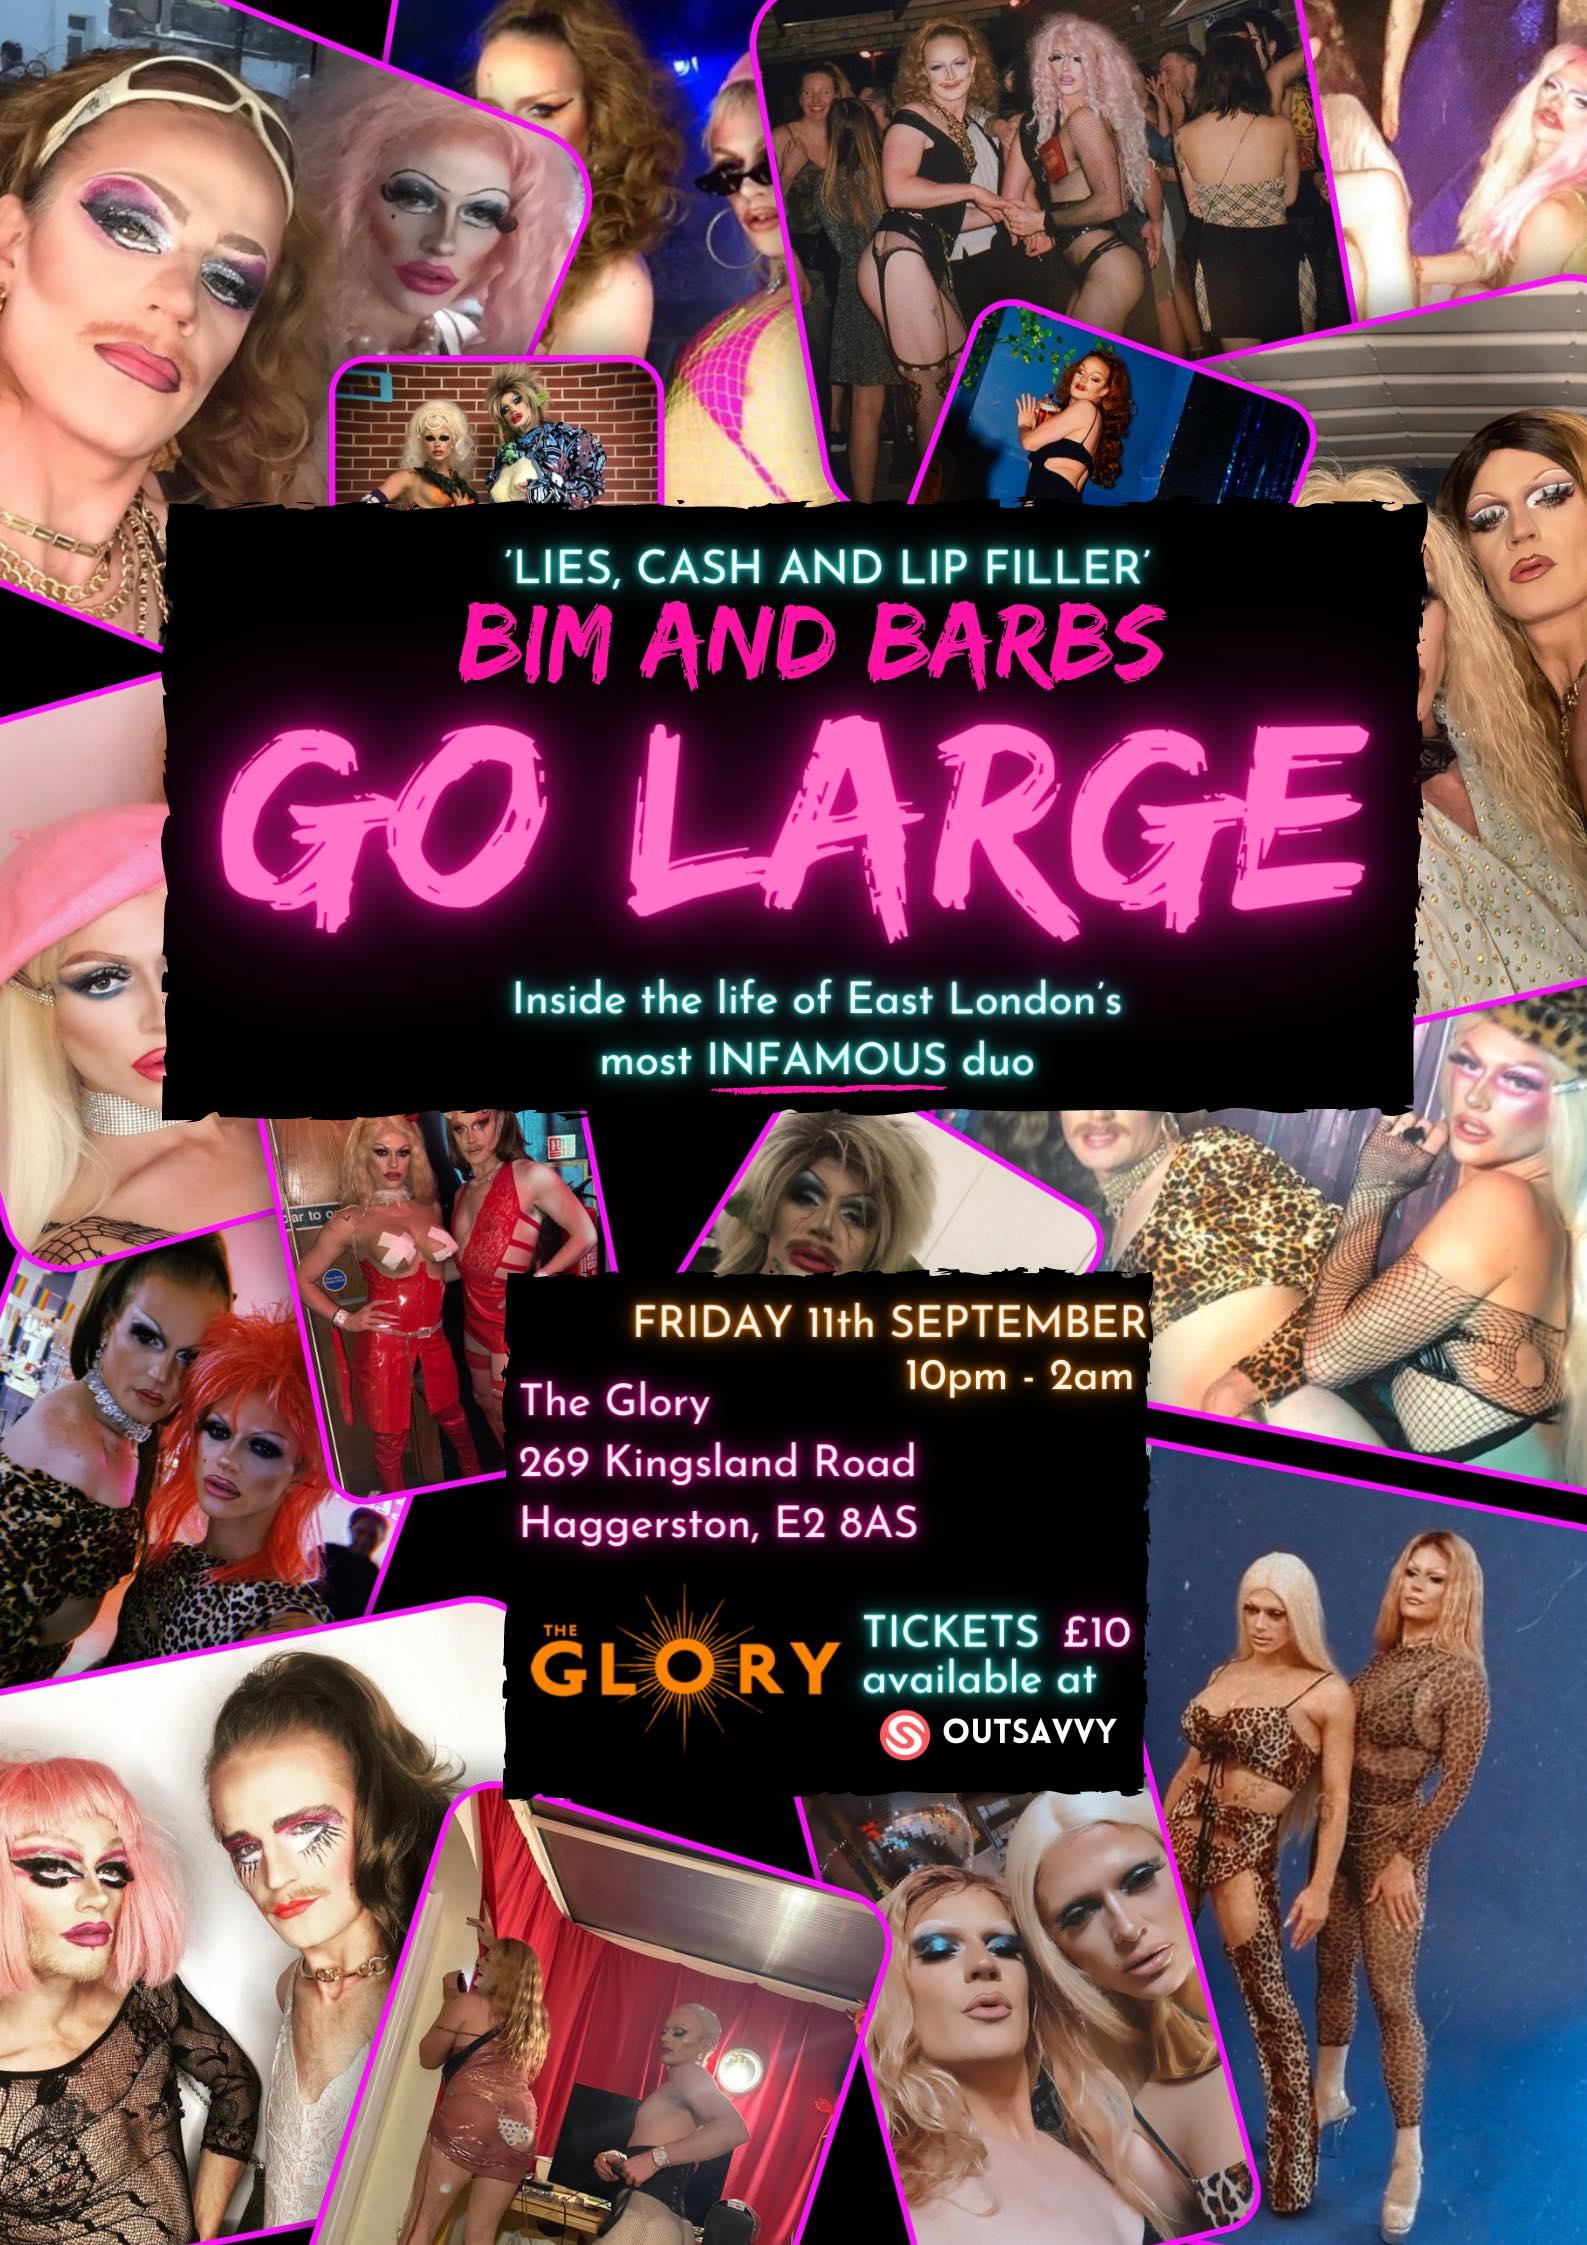 Bim and Barbs Go Large